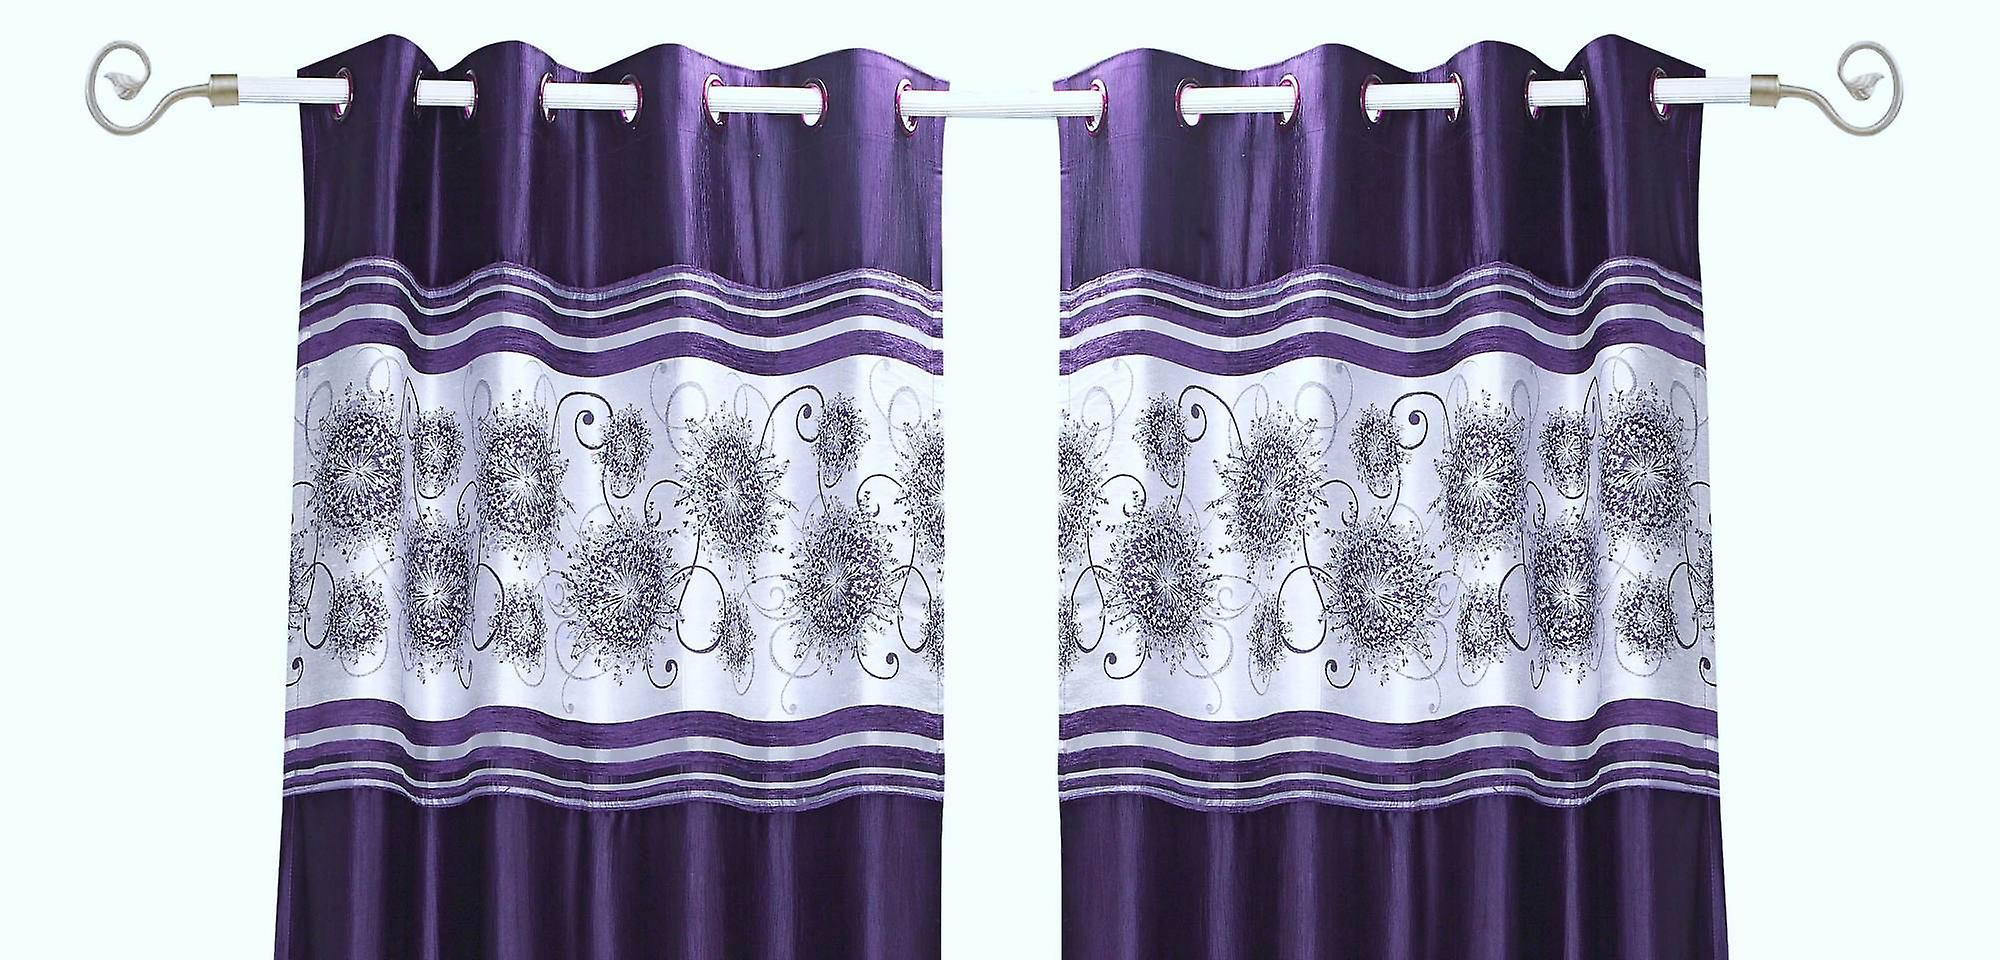 Grommet Top Curtains 63 Inch Purple Grommet Top Satin Curtain Panel Drape Warm Home Designs 54